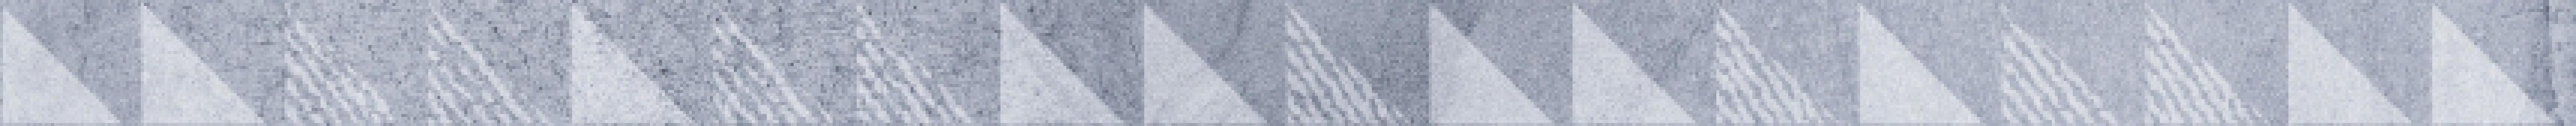 1506-0023 вестанвинд бордюр 2,5x60 голубой настенный LASSELSBERGER | LB Ceramica